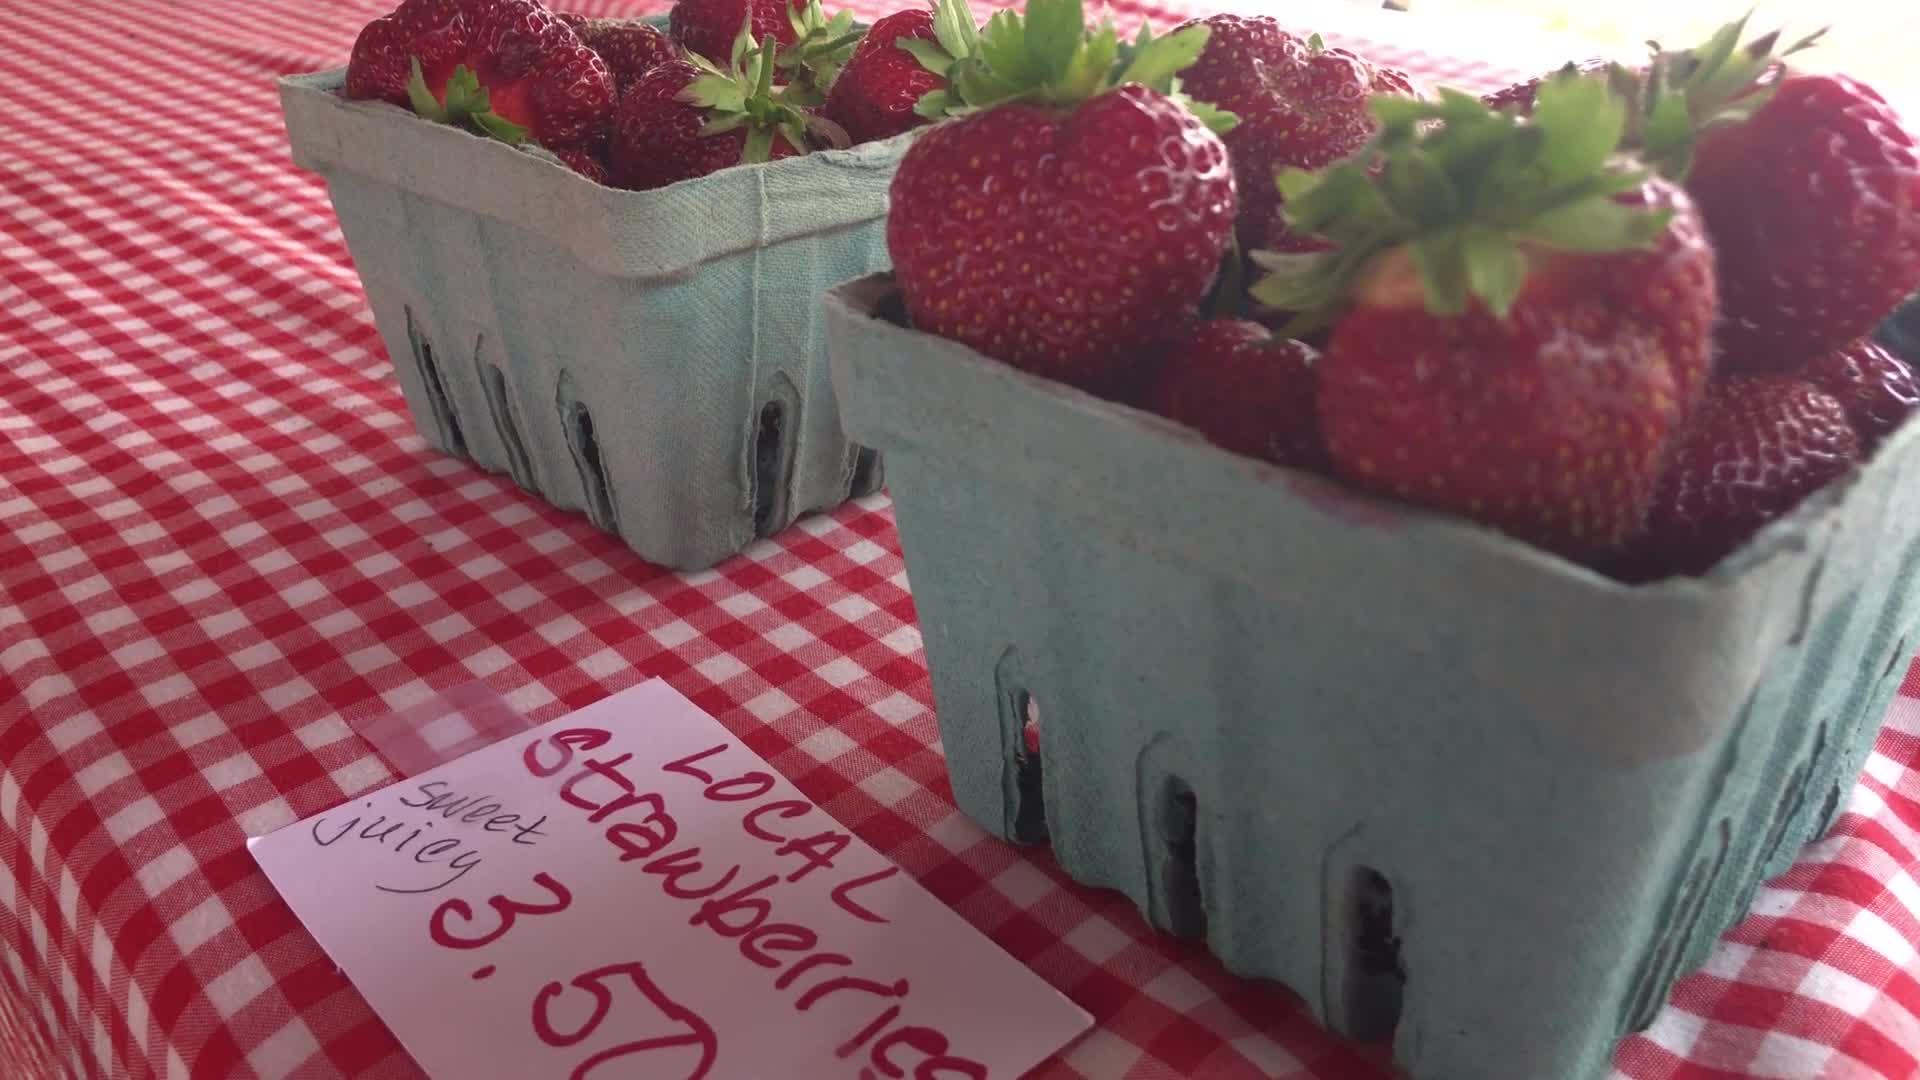 Strawberries at the Altoona Farmer's Market